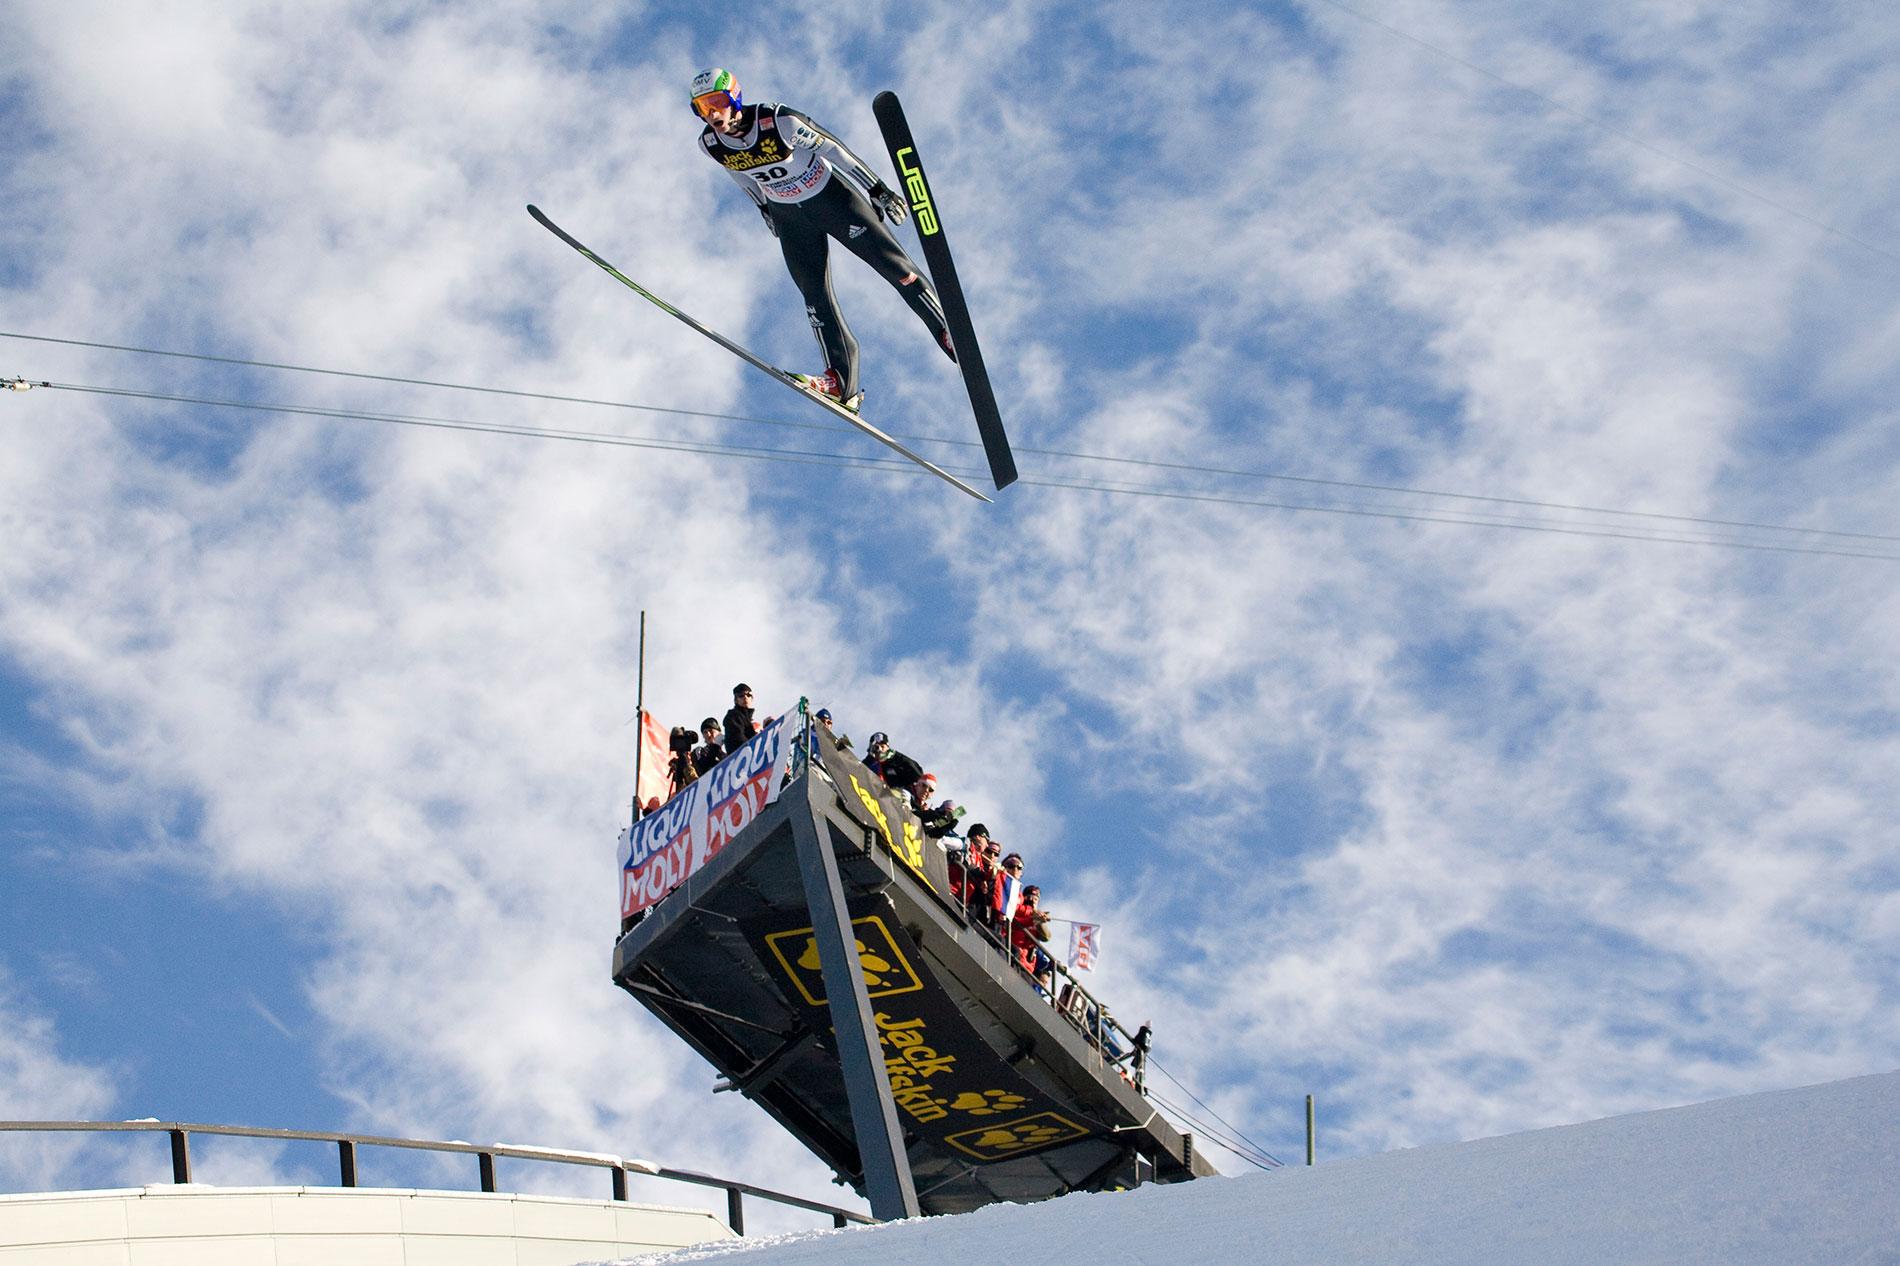 SKI JUMP site photo